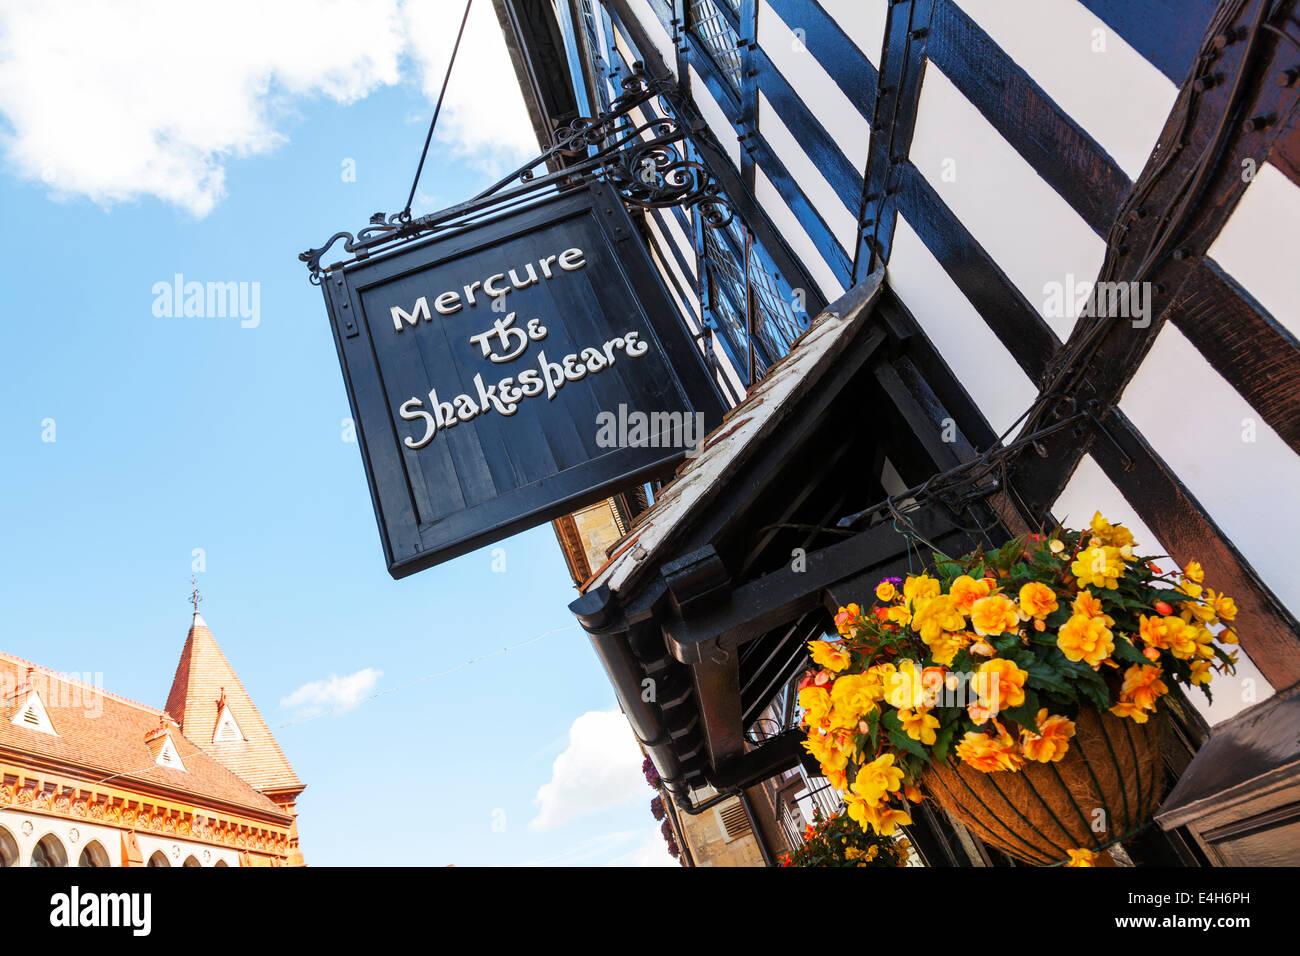 Mercure the Shakespeare tea room restaurant Stratford Upon Avon Cotswolds UK England Tudor building sign exterior - Stock Image